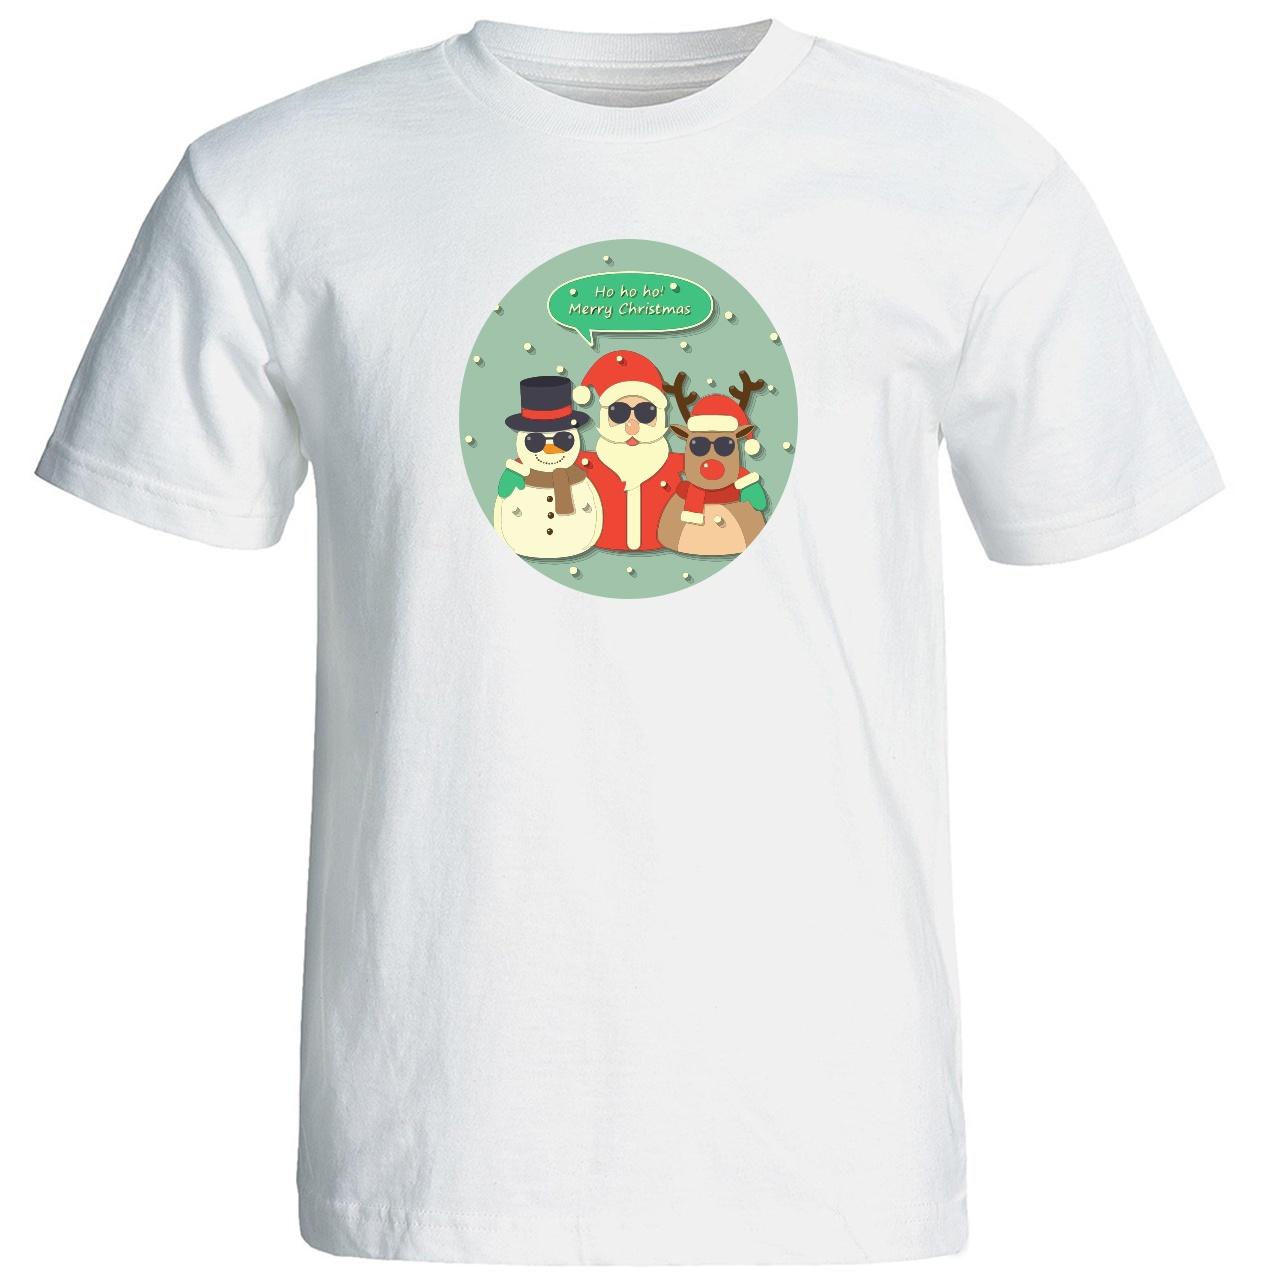 تصویر تی شرت زنانه طرح کریسمس 15502